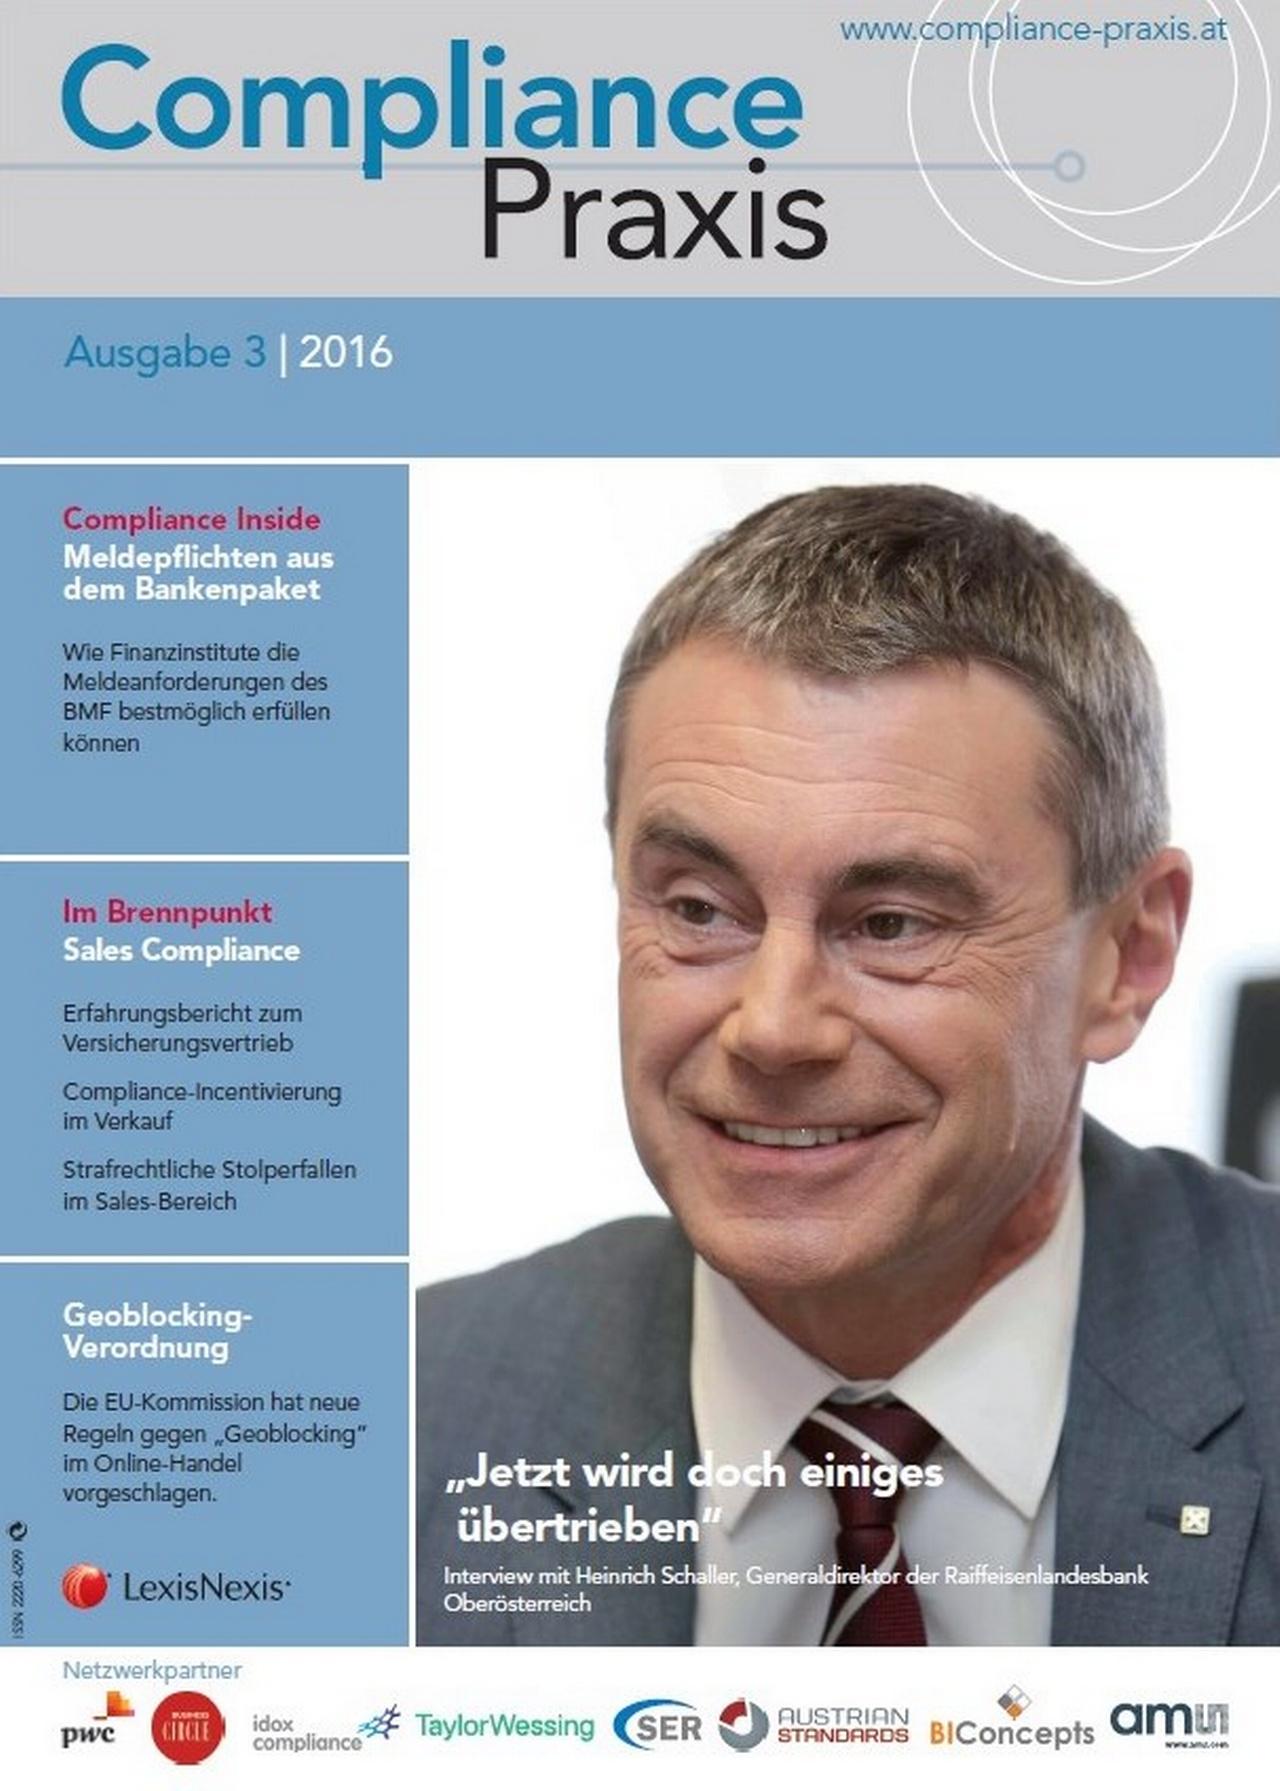 Cover von Compliance Praxis Ausgabe 3/2016, © LexisNexis